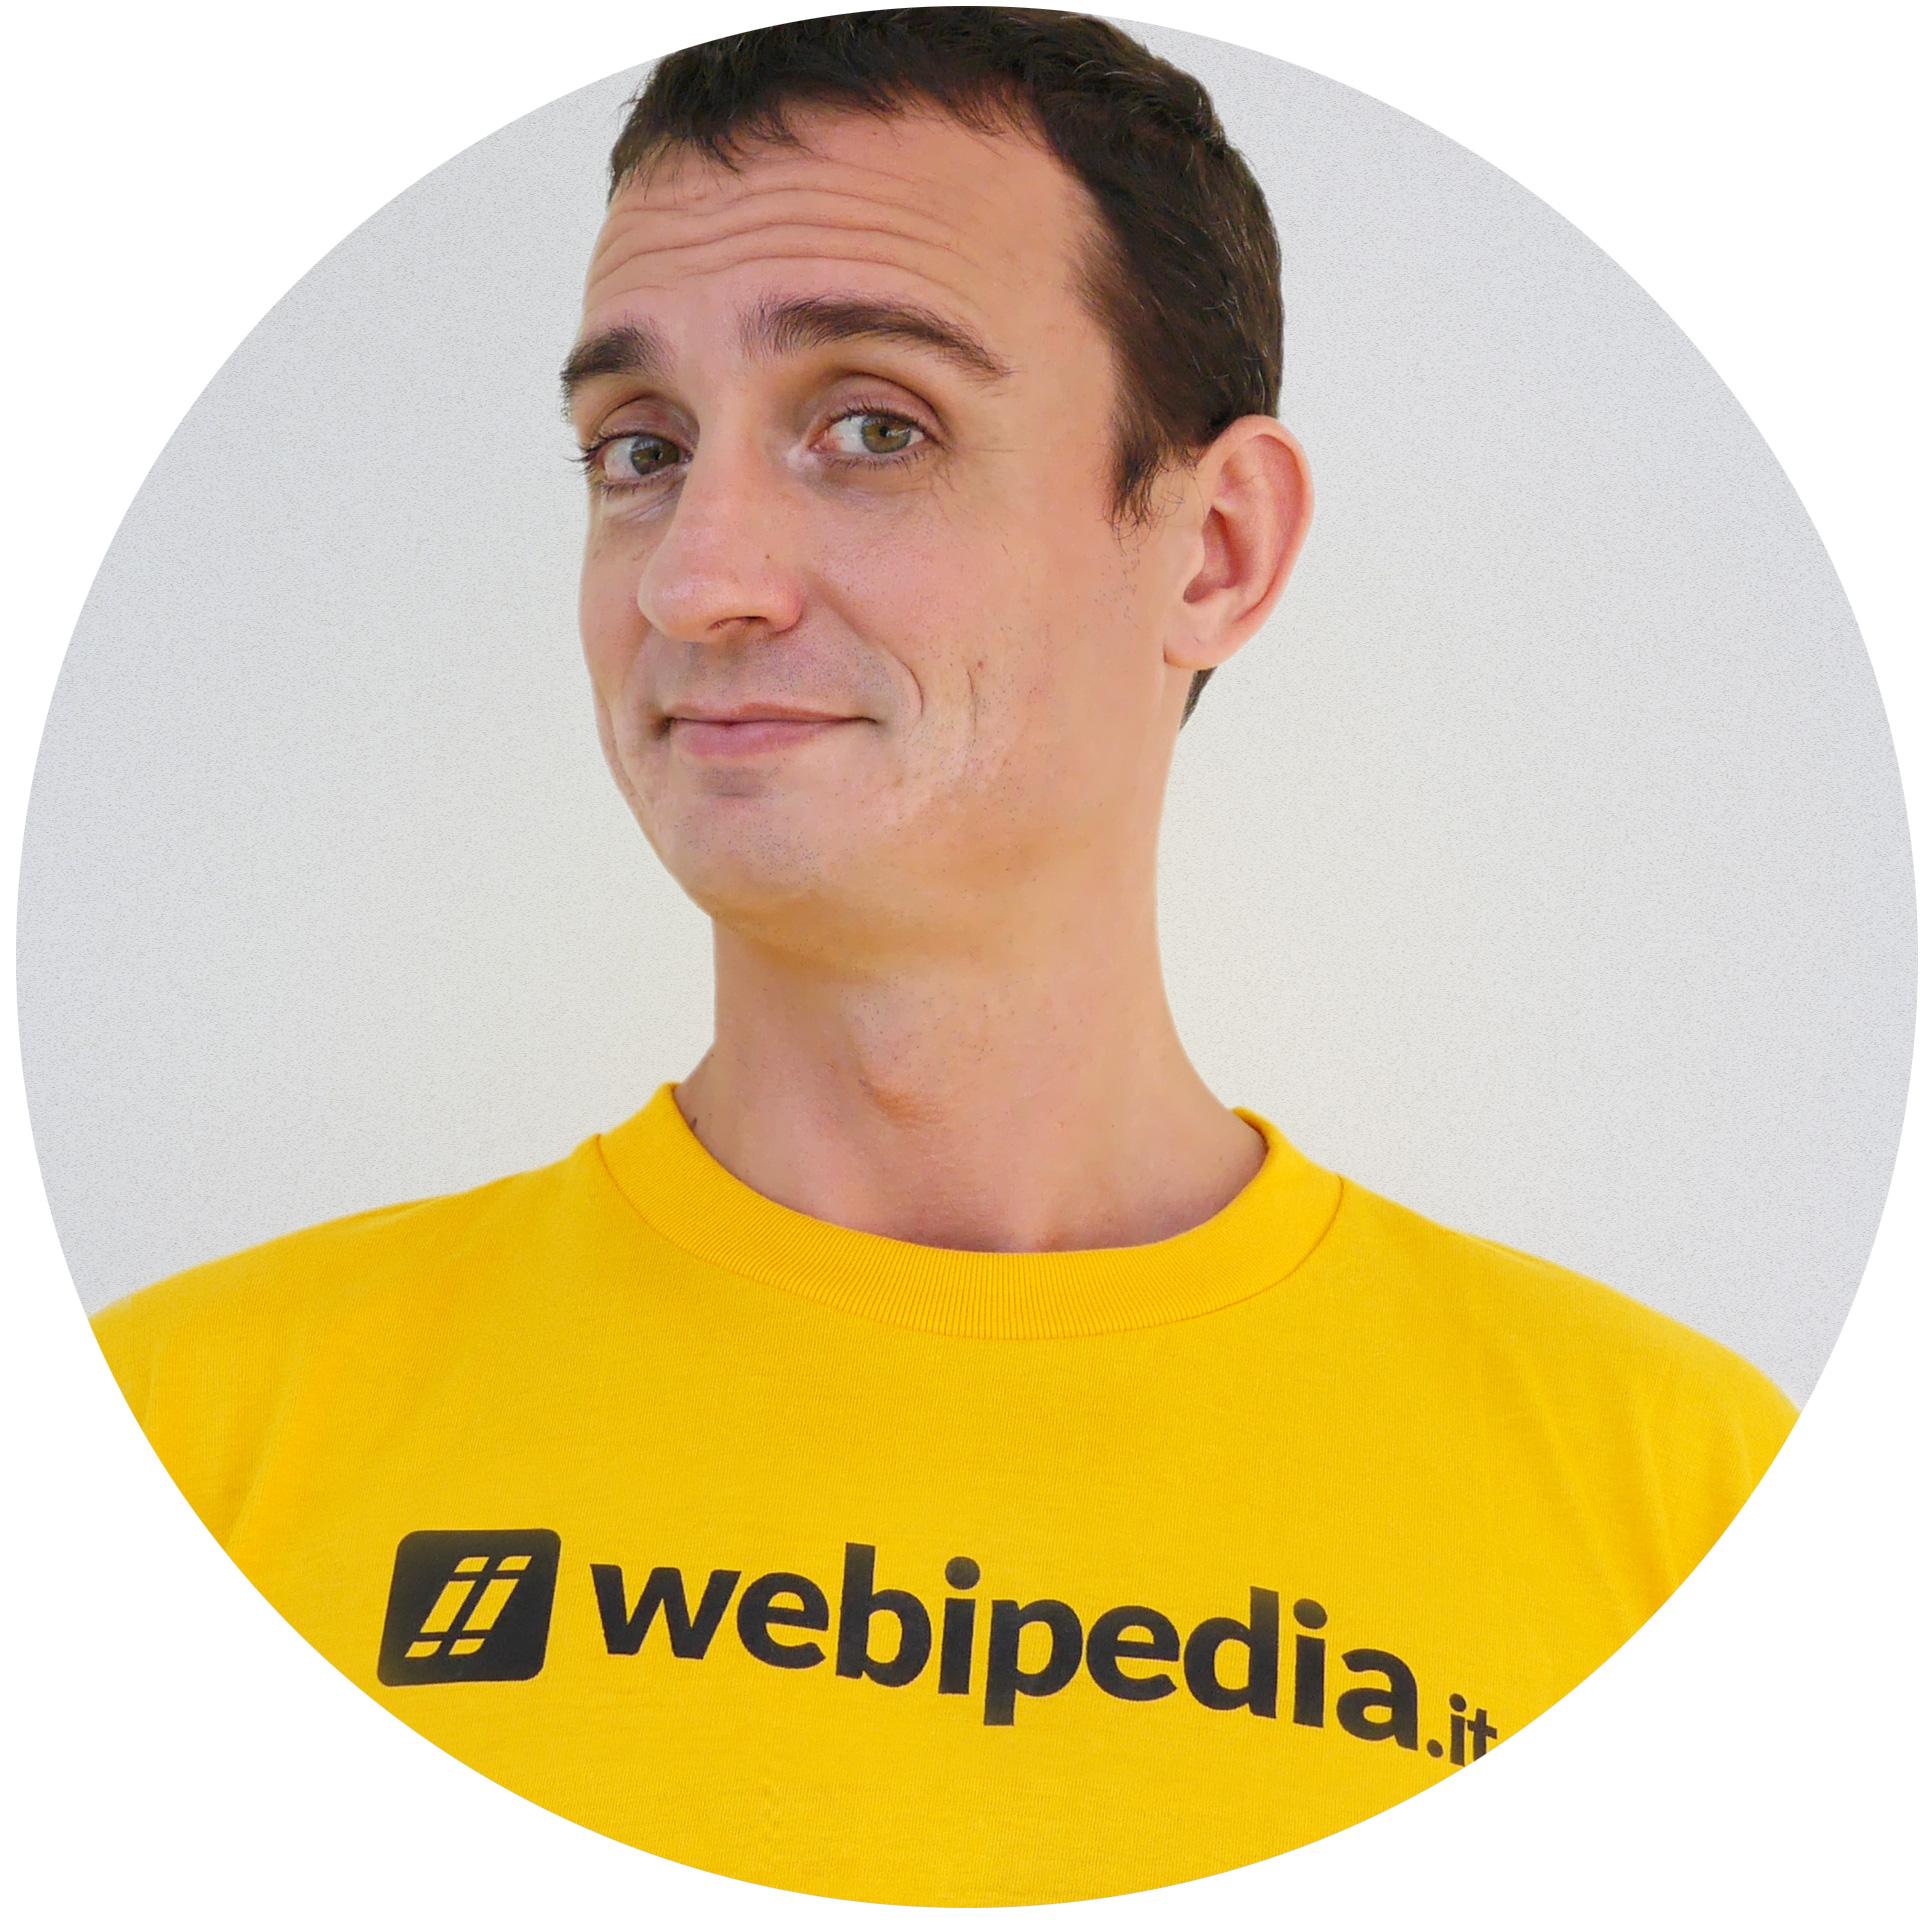 Lorenzo Novia Webipedia.it